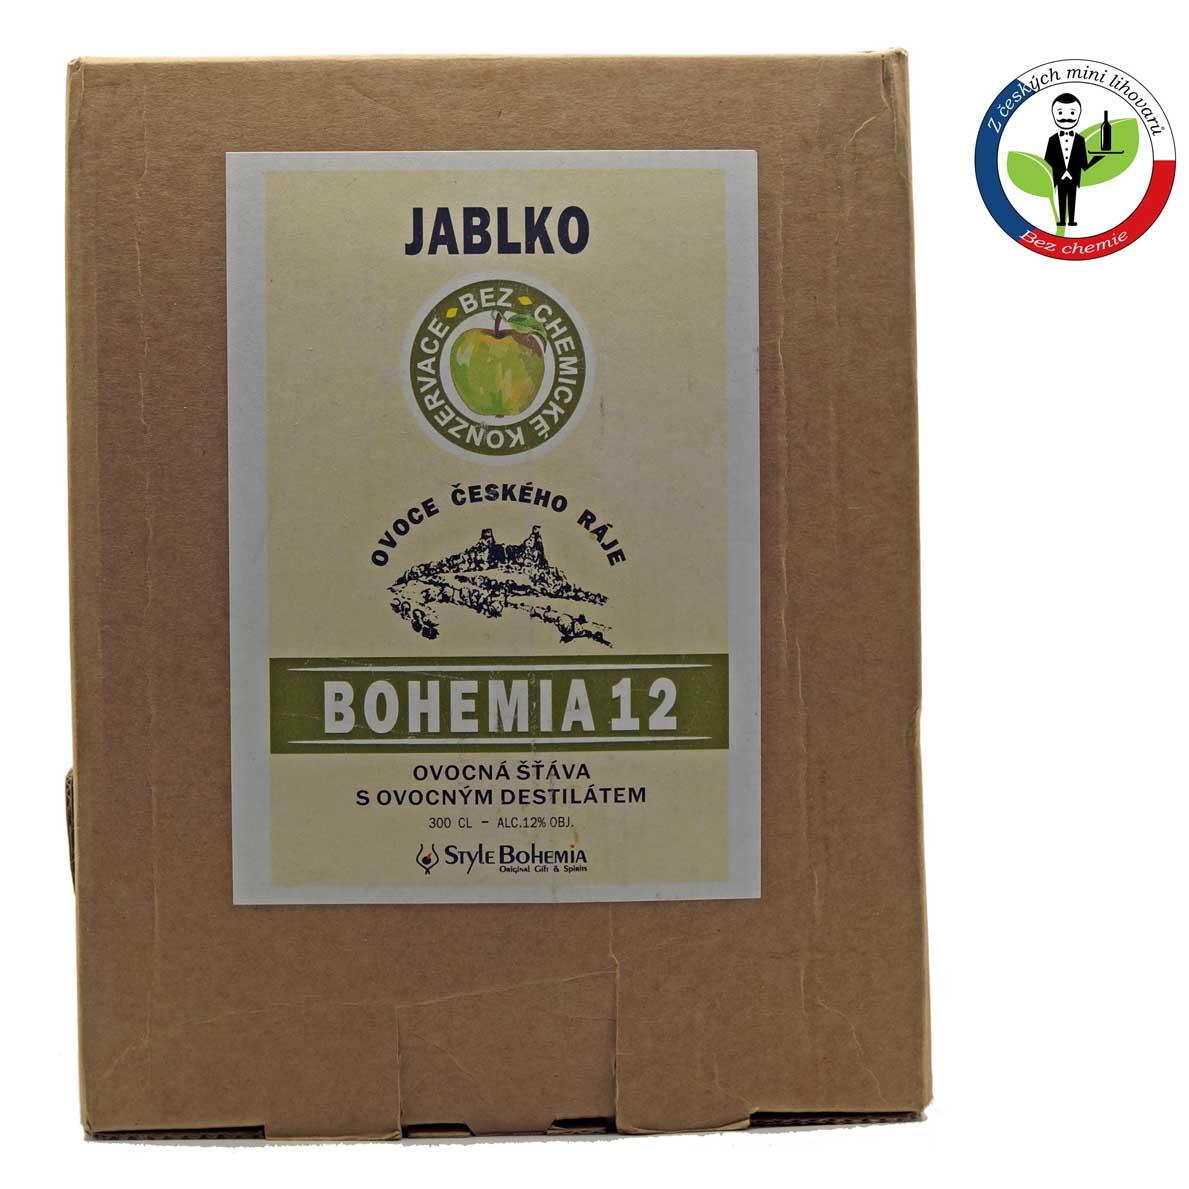 Bohemia 12 Jablko BOX 3l - alkoholizovaný mošt